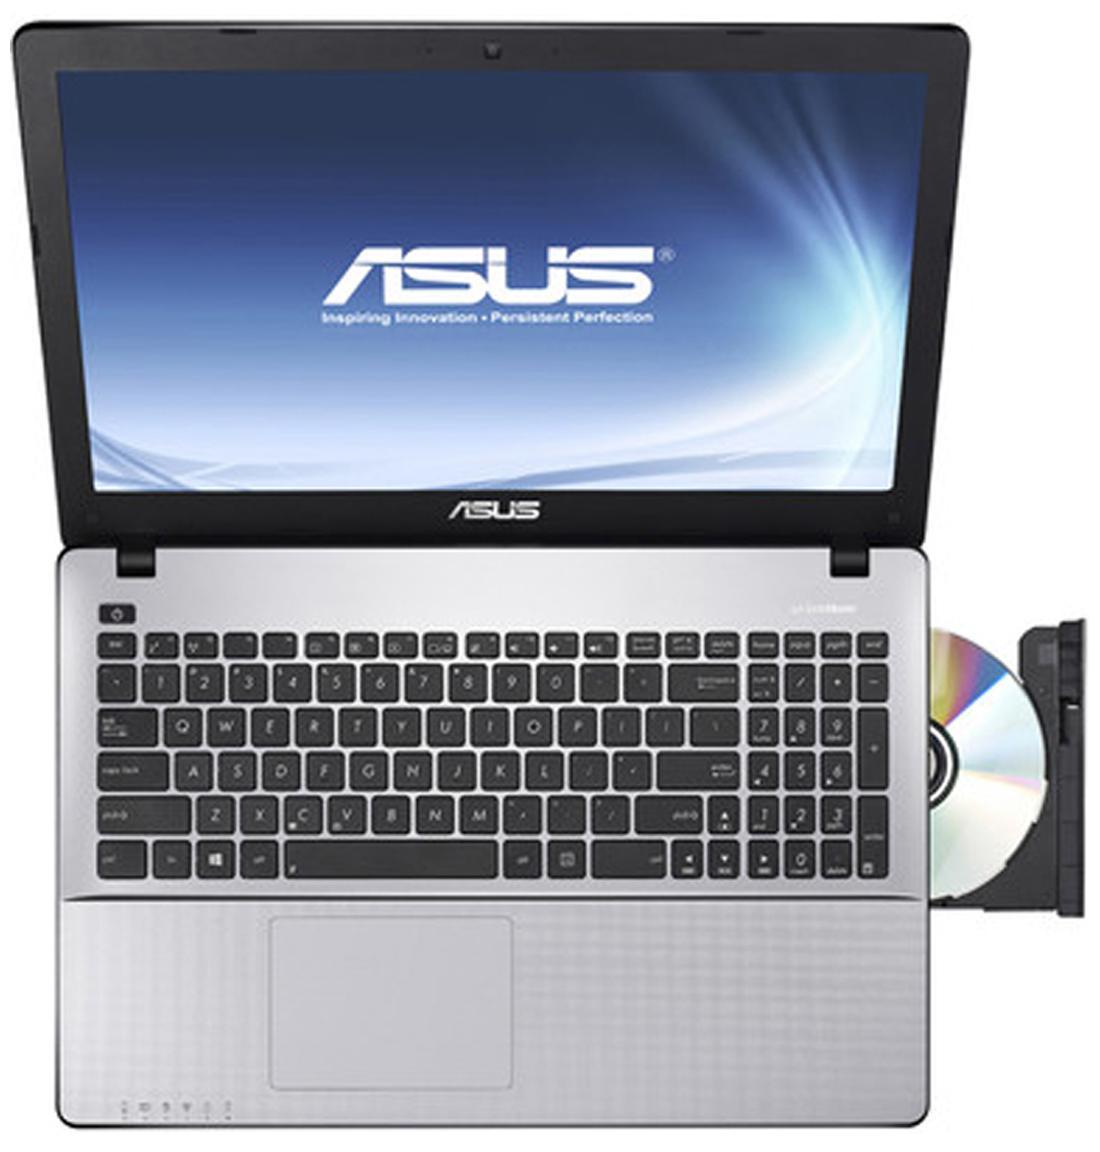 Asus X550LD  XX082D Notebook  Core i7  4th Gen  / 8 GB DDR3/ 1TB HDD/ 39.62 cm  15.6 /2  GB Graphics/DOS  Grey